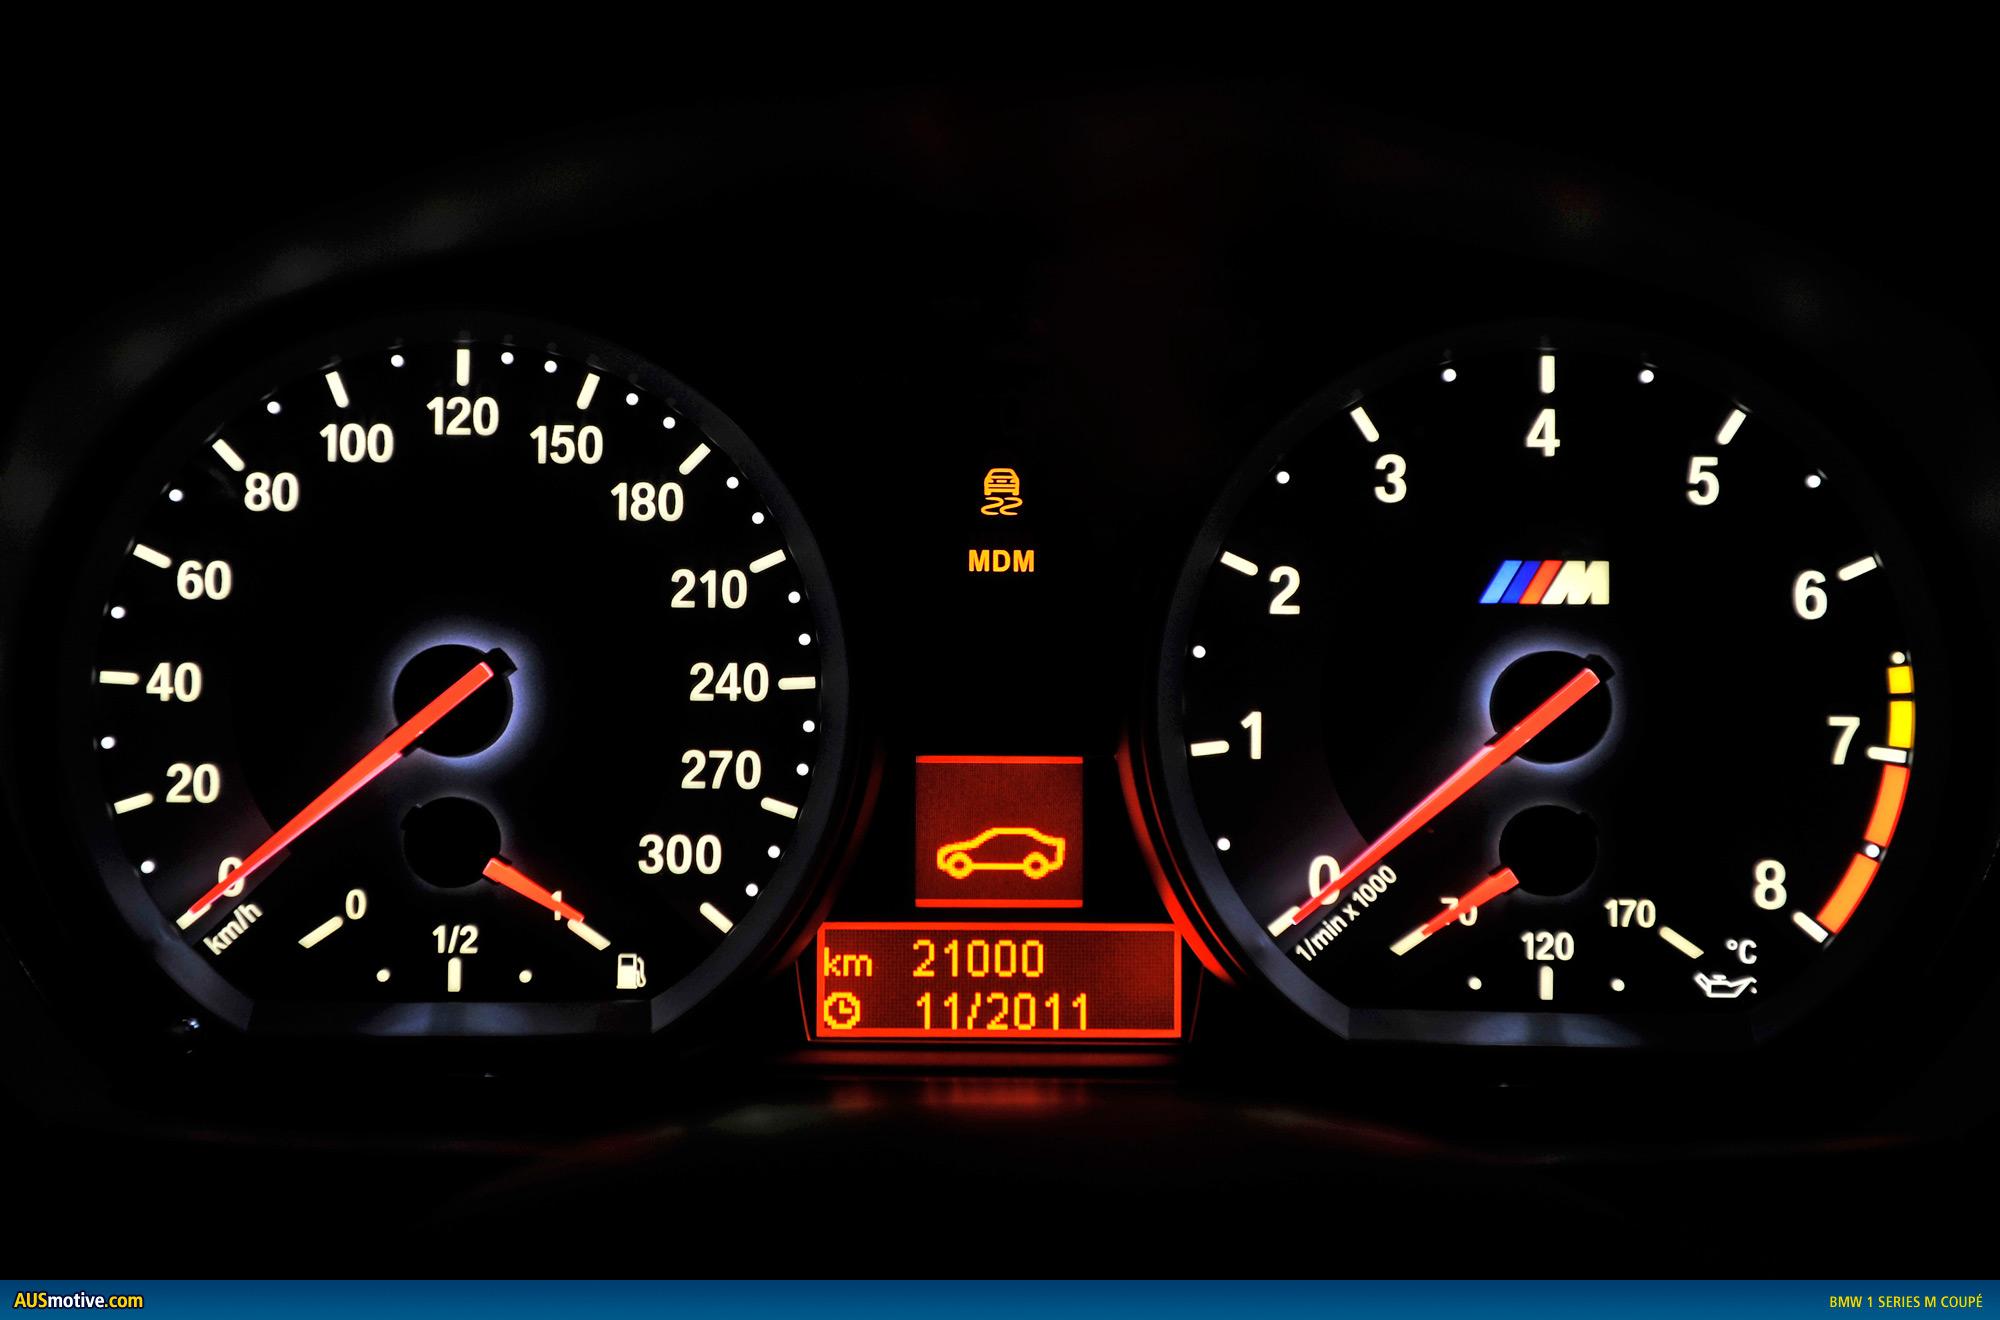 Illuminate ///M logo in Instrument Cluster - BMW M3 Forum